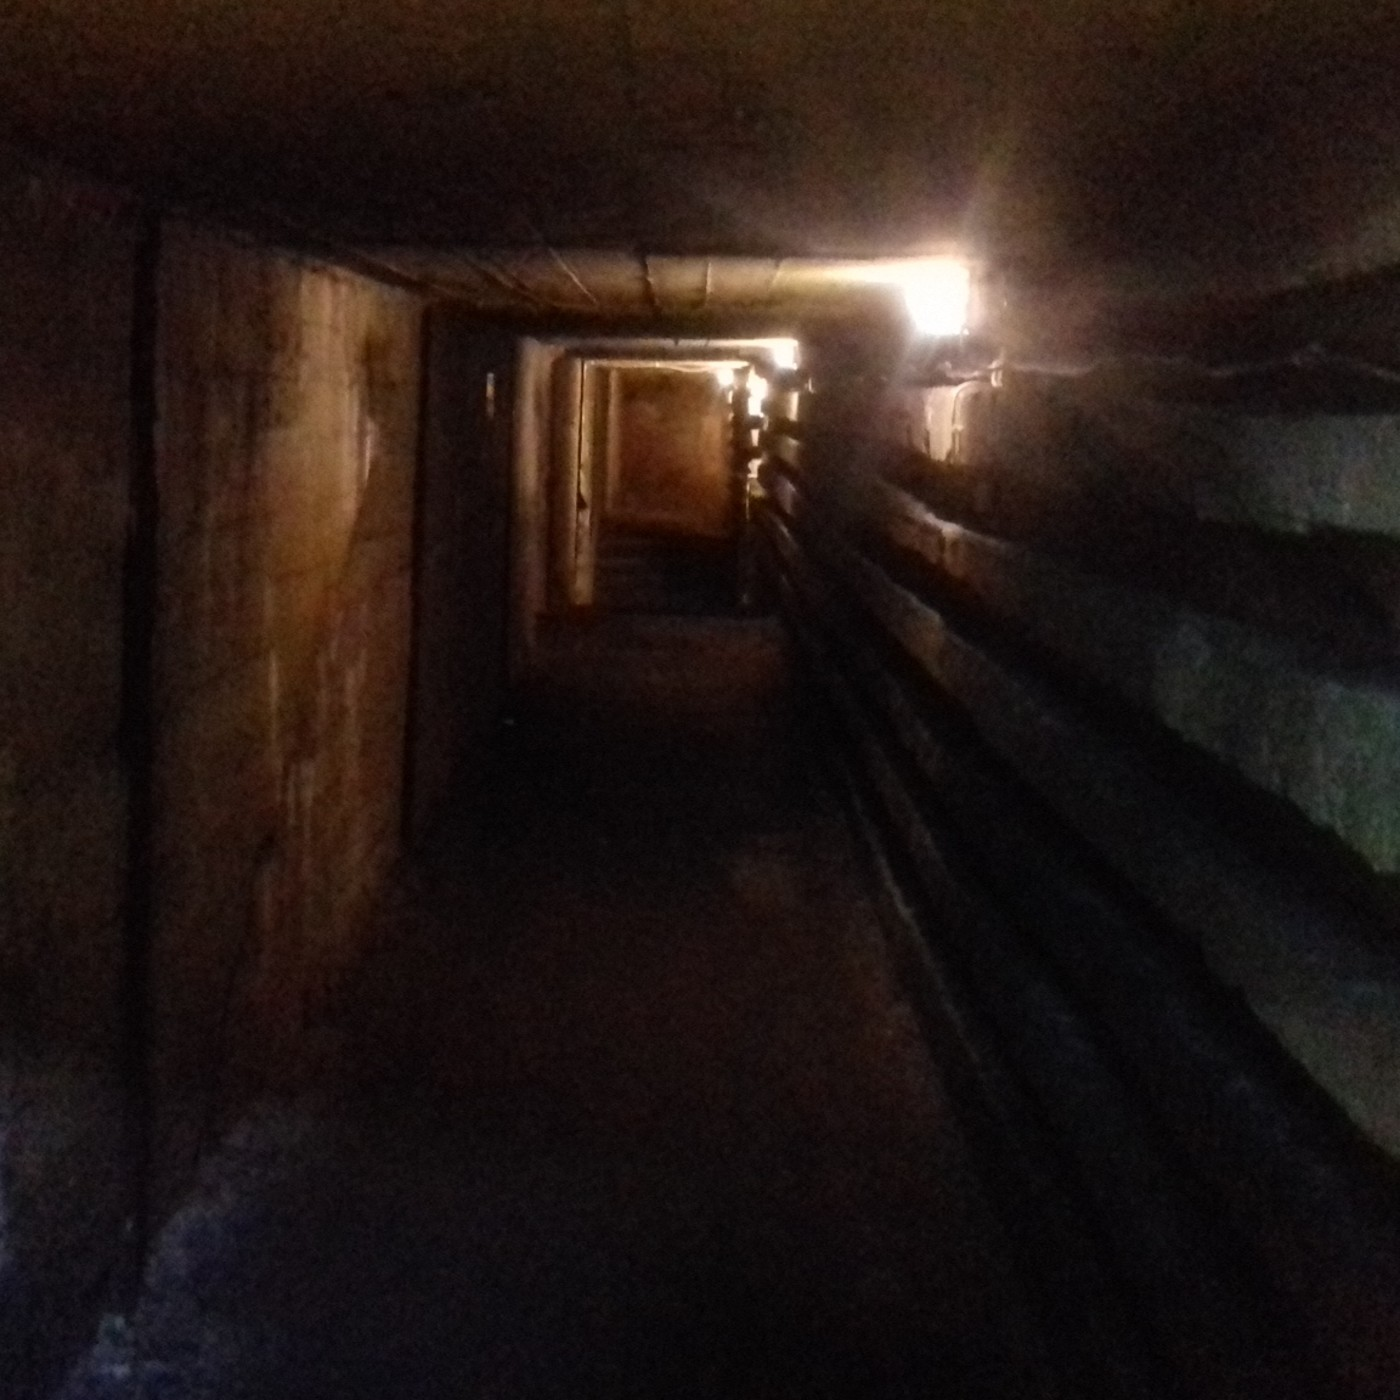 Planeta Zero - 06 - Der Riese, la ciudad subterranea nazi